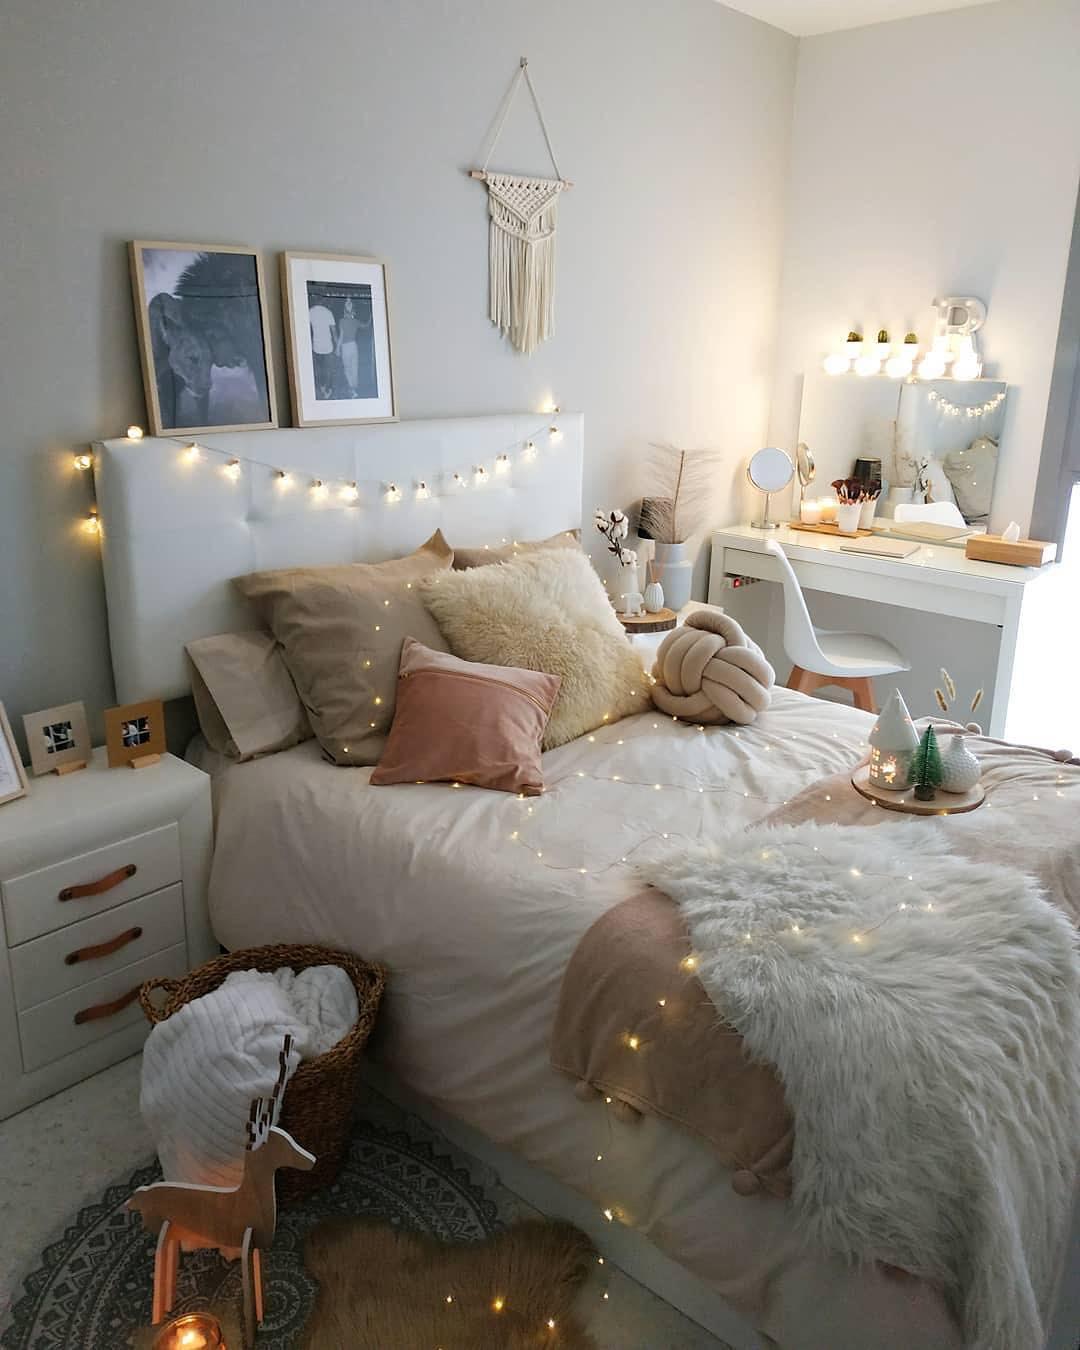 55 Creative Bohemian Bedroom Decor Ideas #dormroom #dormroomdecor #collegedormroom